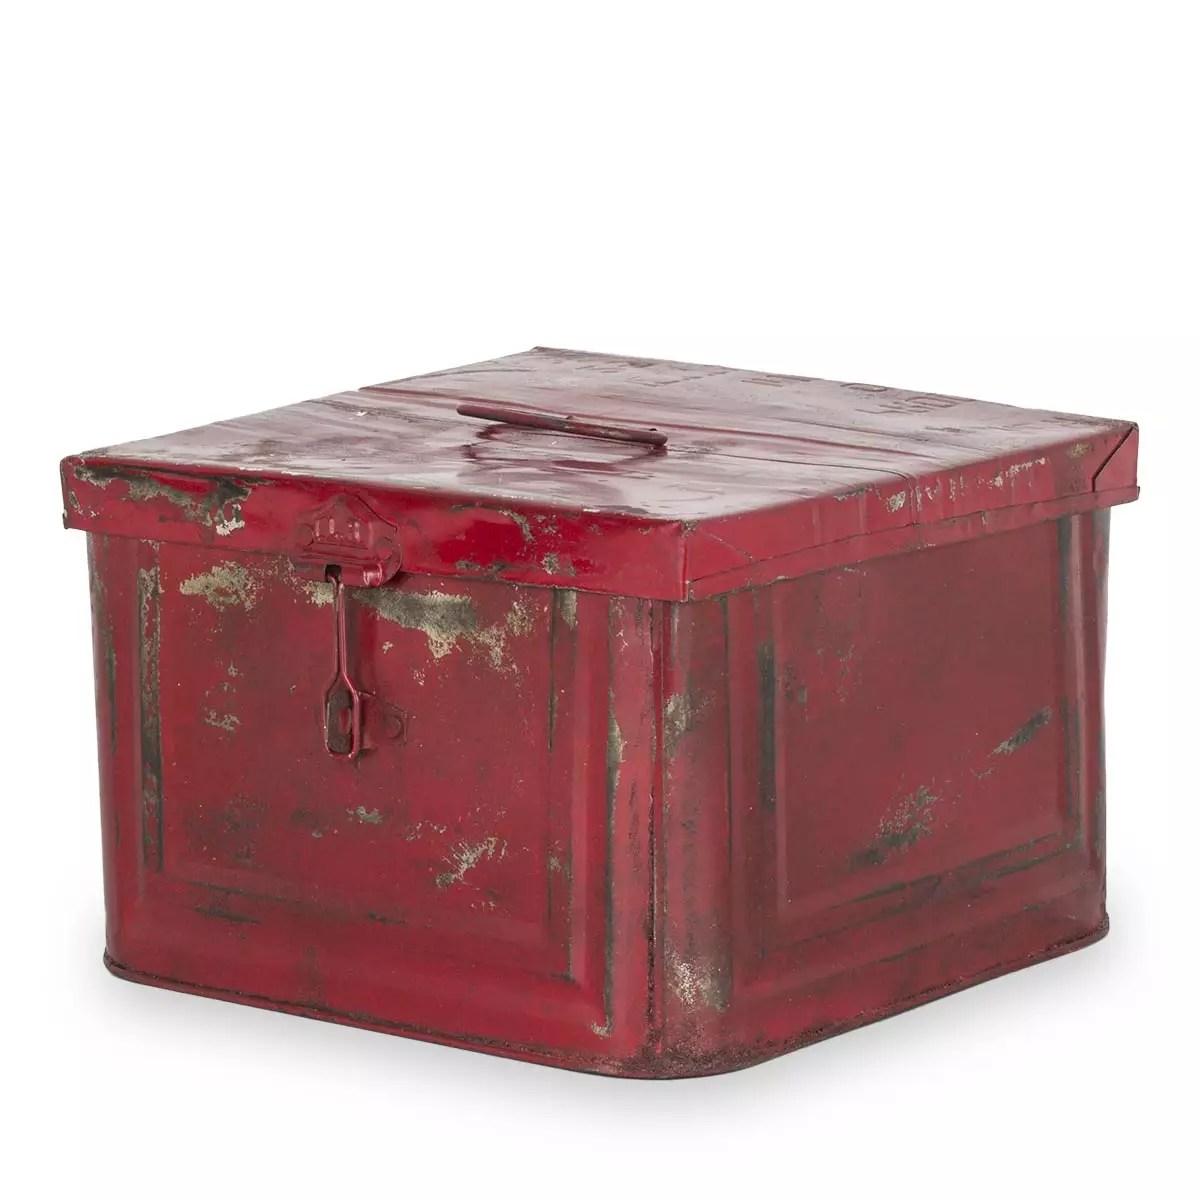 Decorative Metal Boxes Vintage Boxes By Francisco Segarra